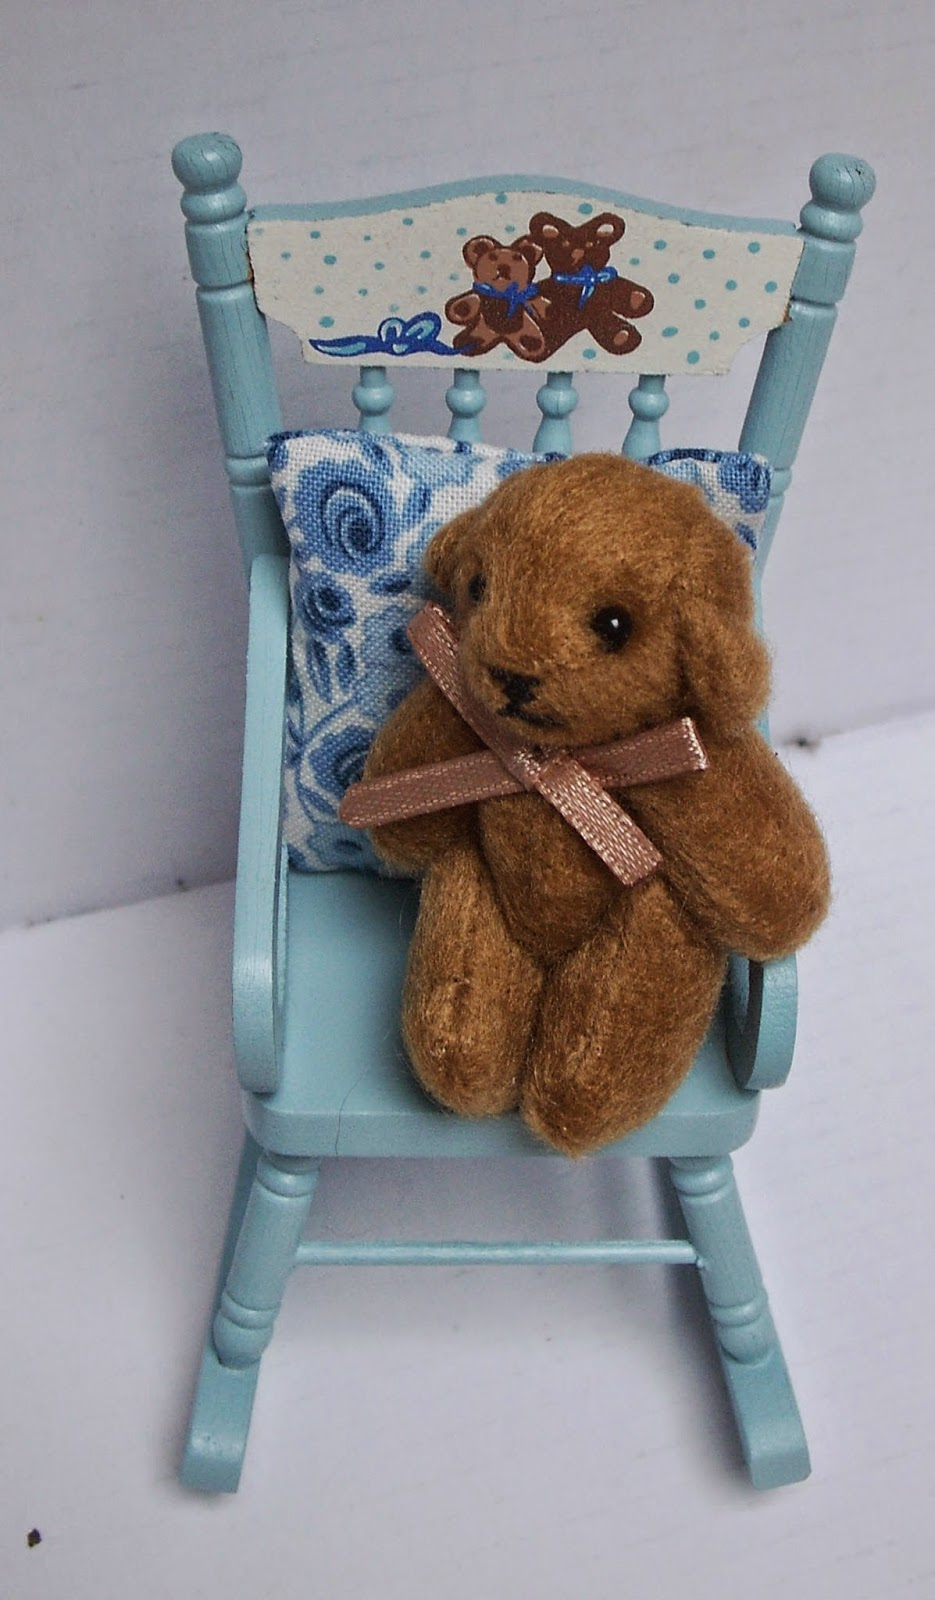 Cherry Croft Teddy Bears And Rocking Chairs